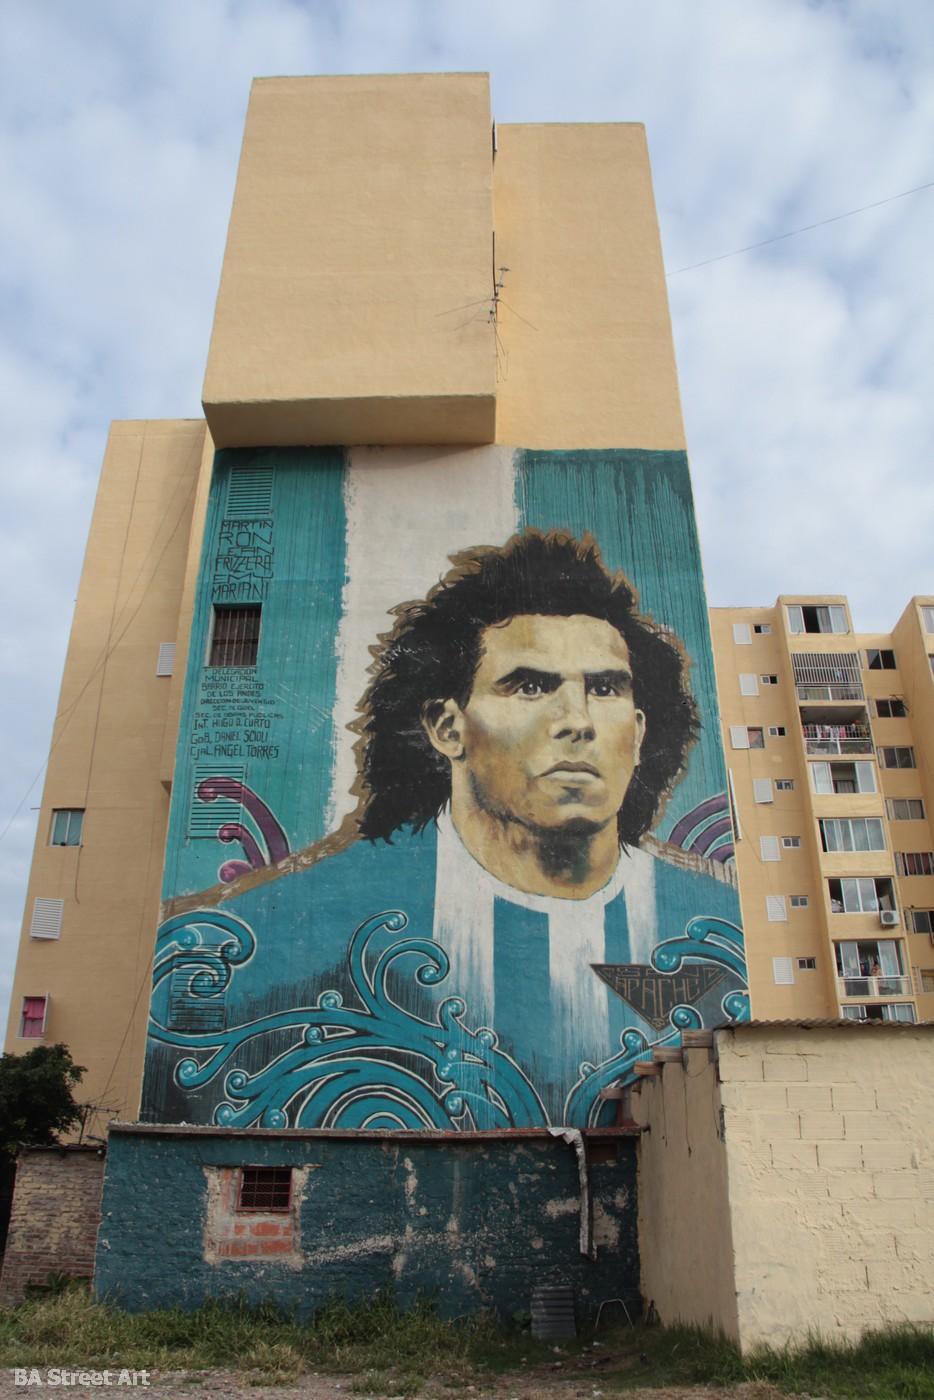 carlos tevez manchester city juventus manchester united street art argentina mural buenos aires buenosairesstreetart.com